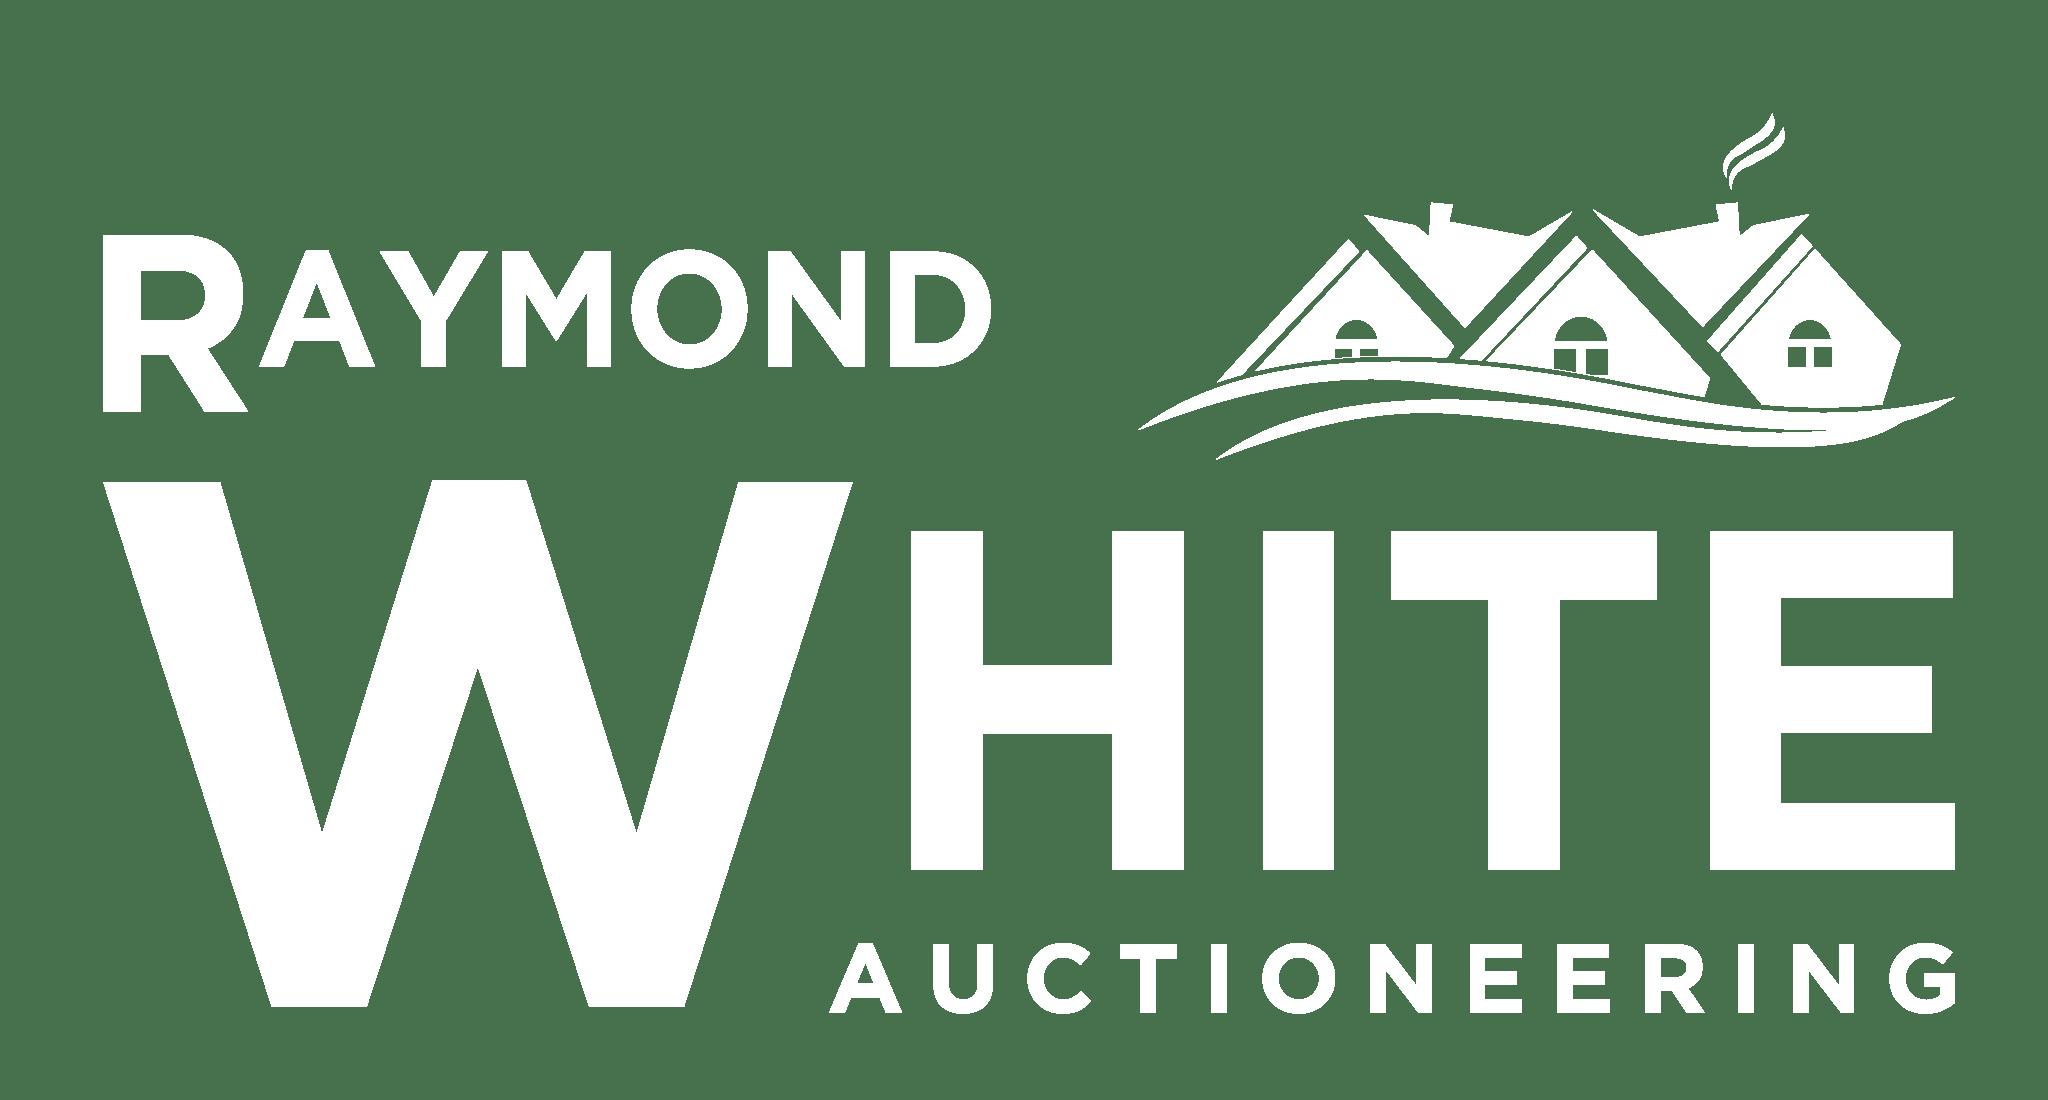 Raymondwhite.ie